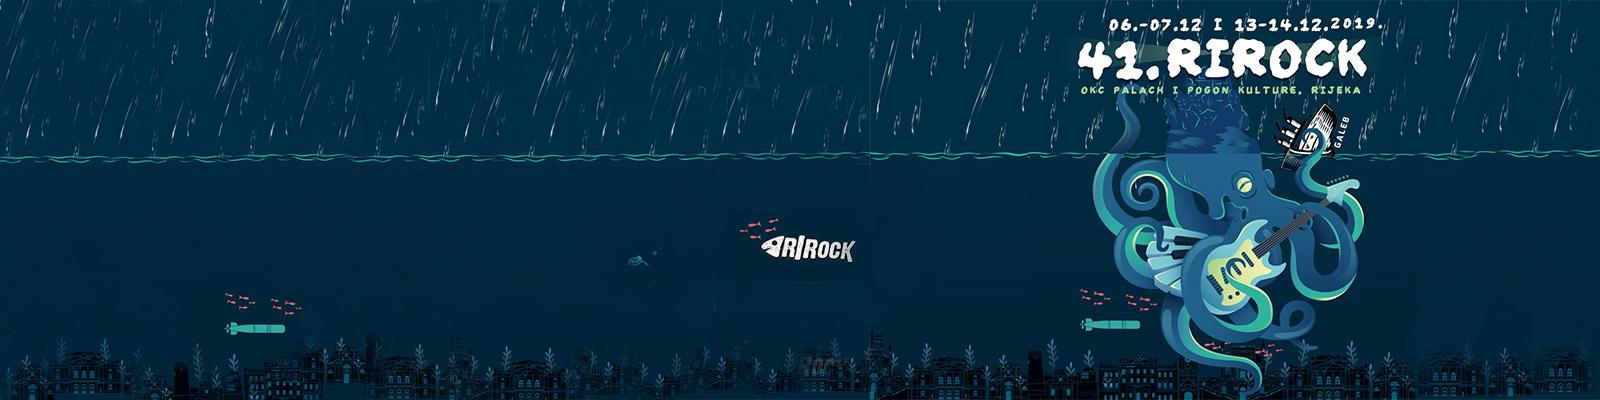 41. Ri rock